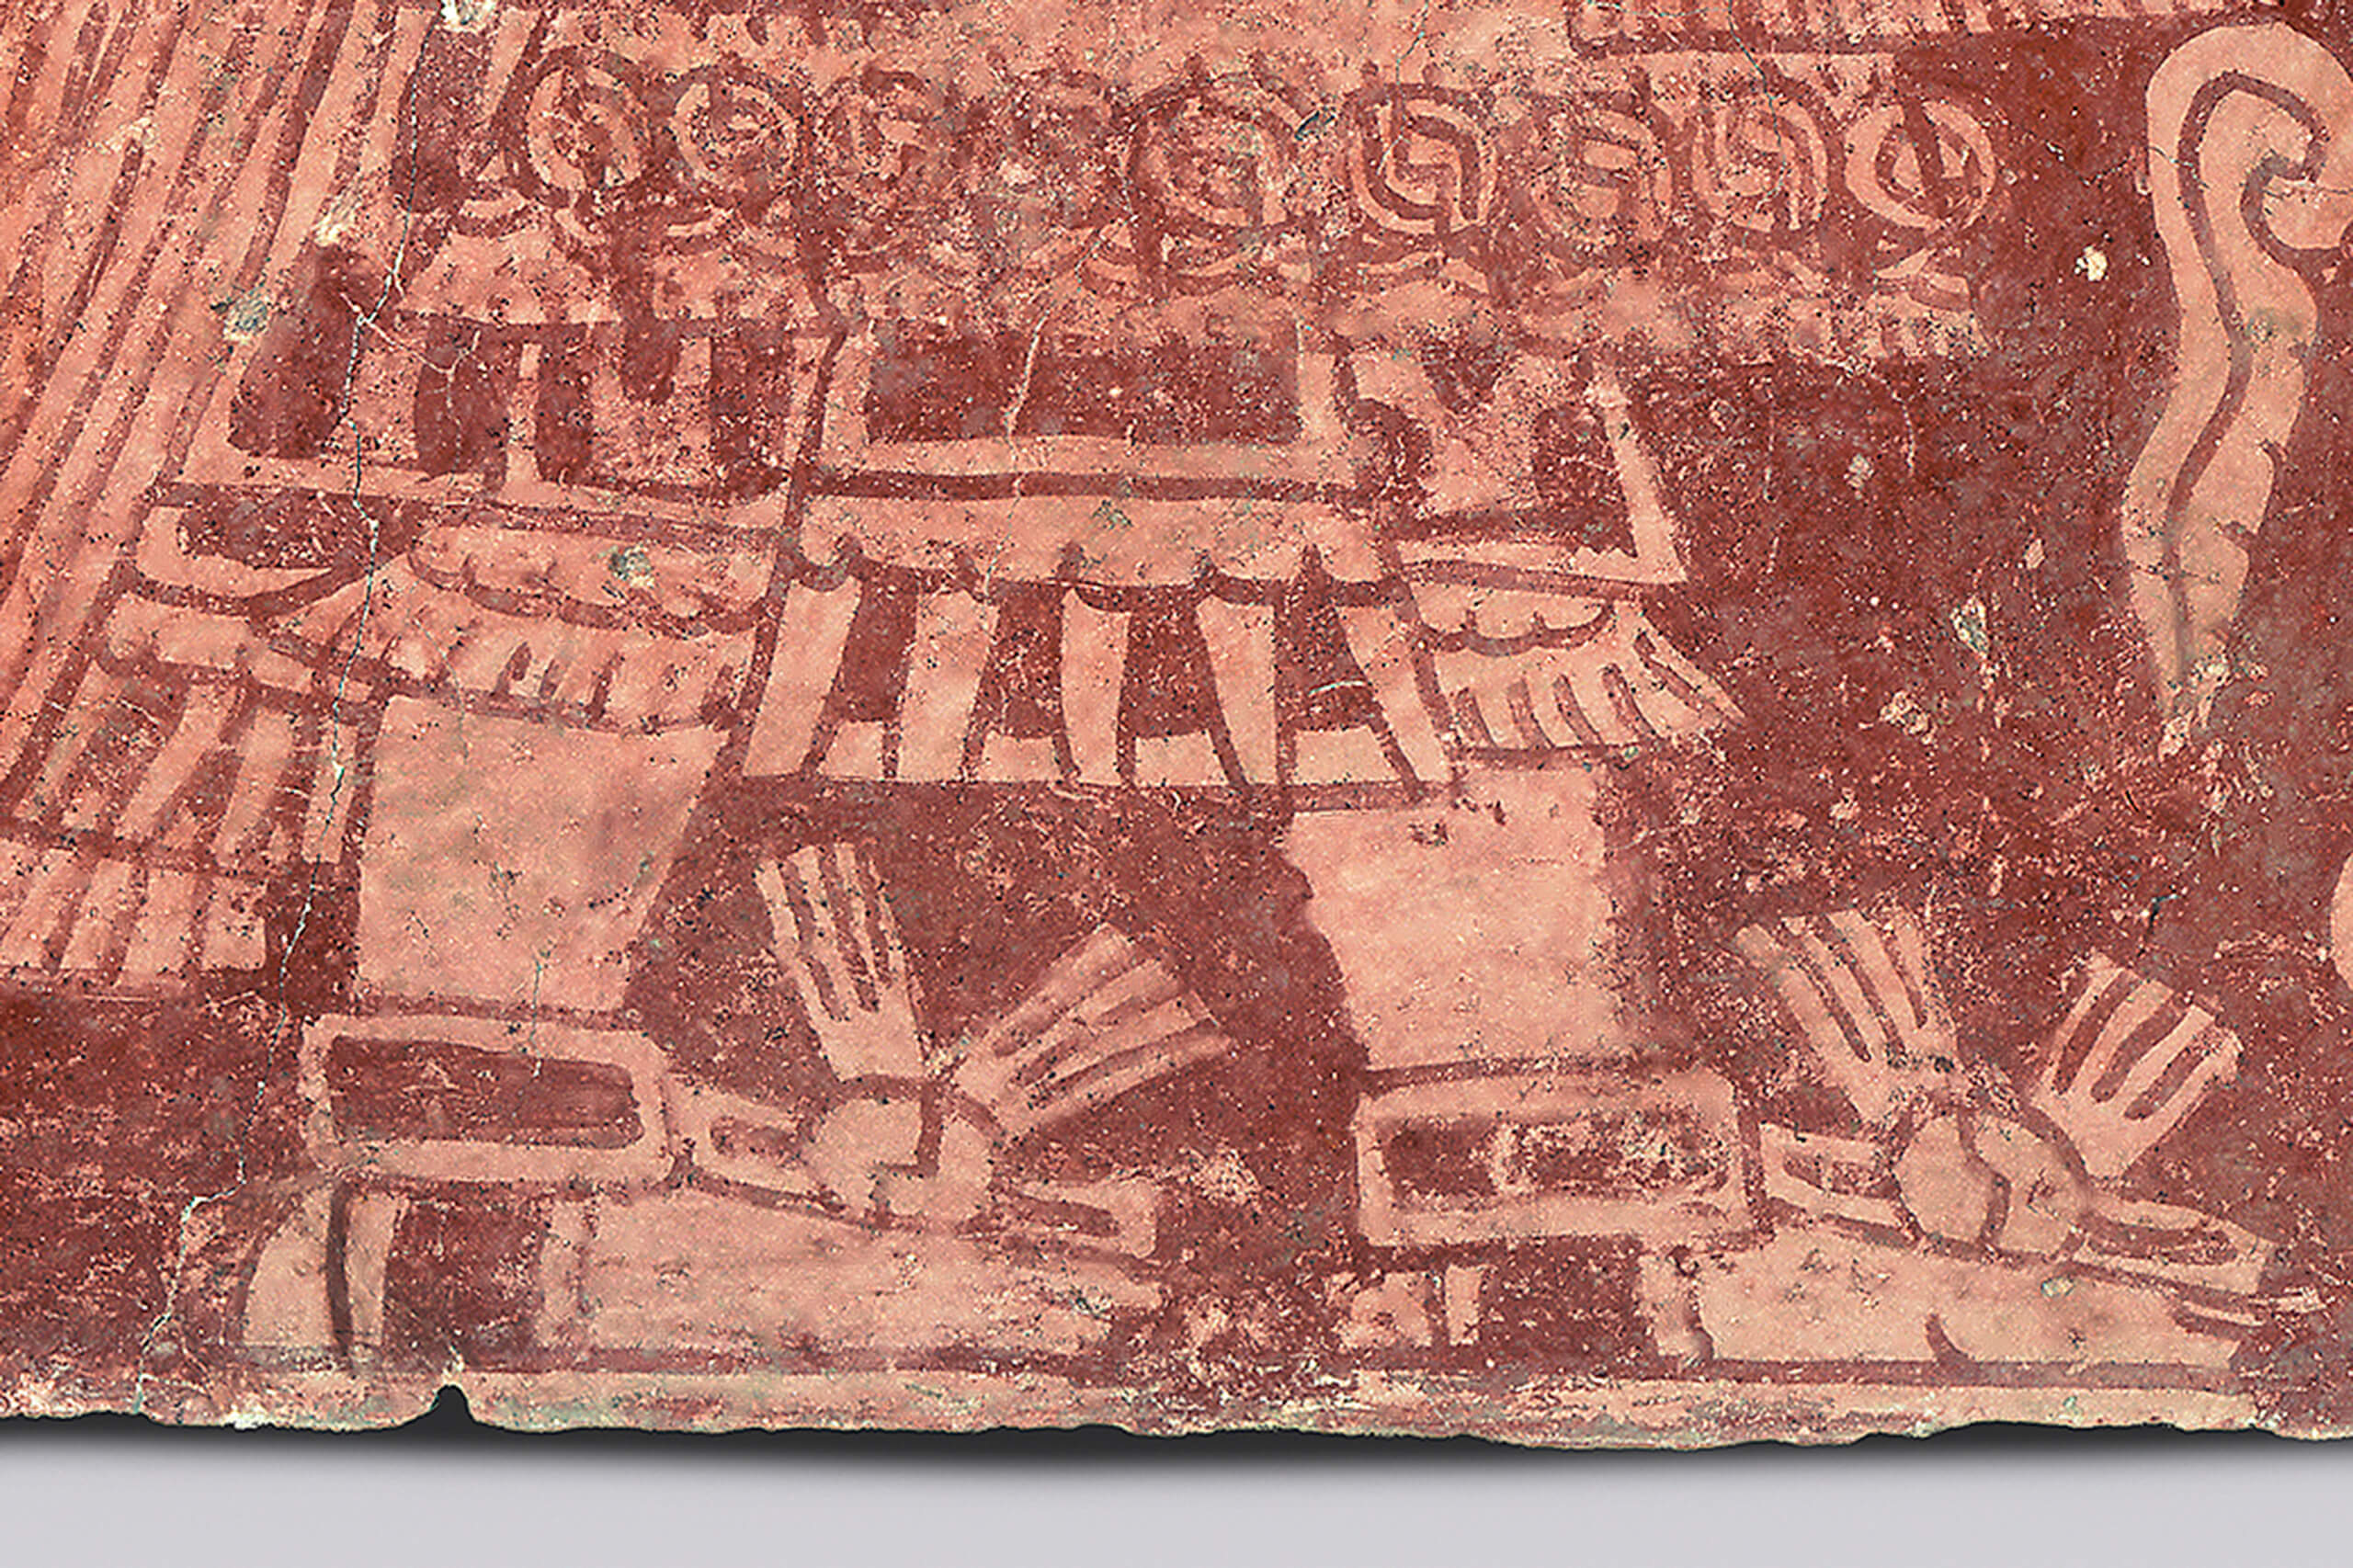 El dios tl loc fragmento de pintura mural el m xico for El mural avisos de ocasion